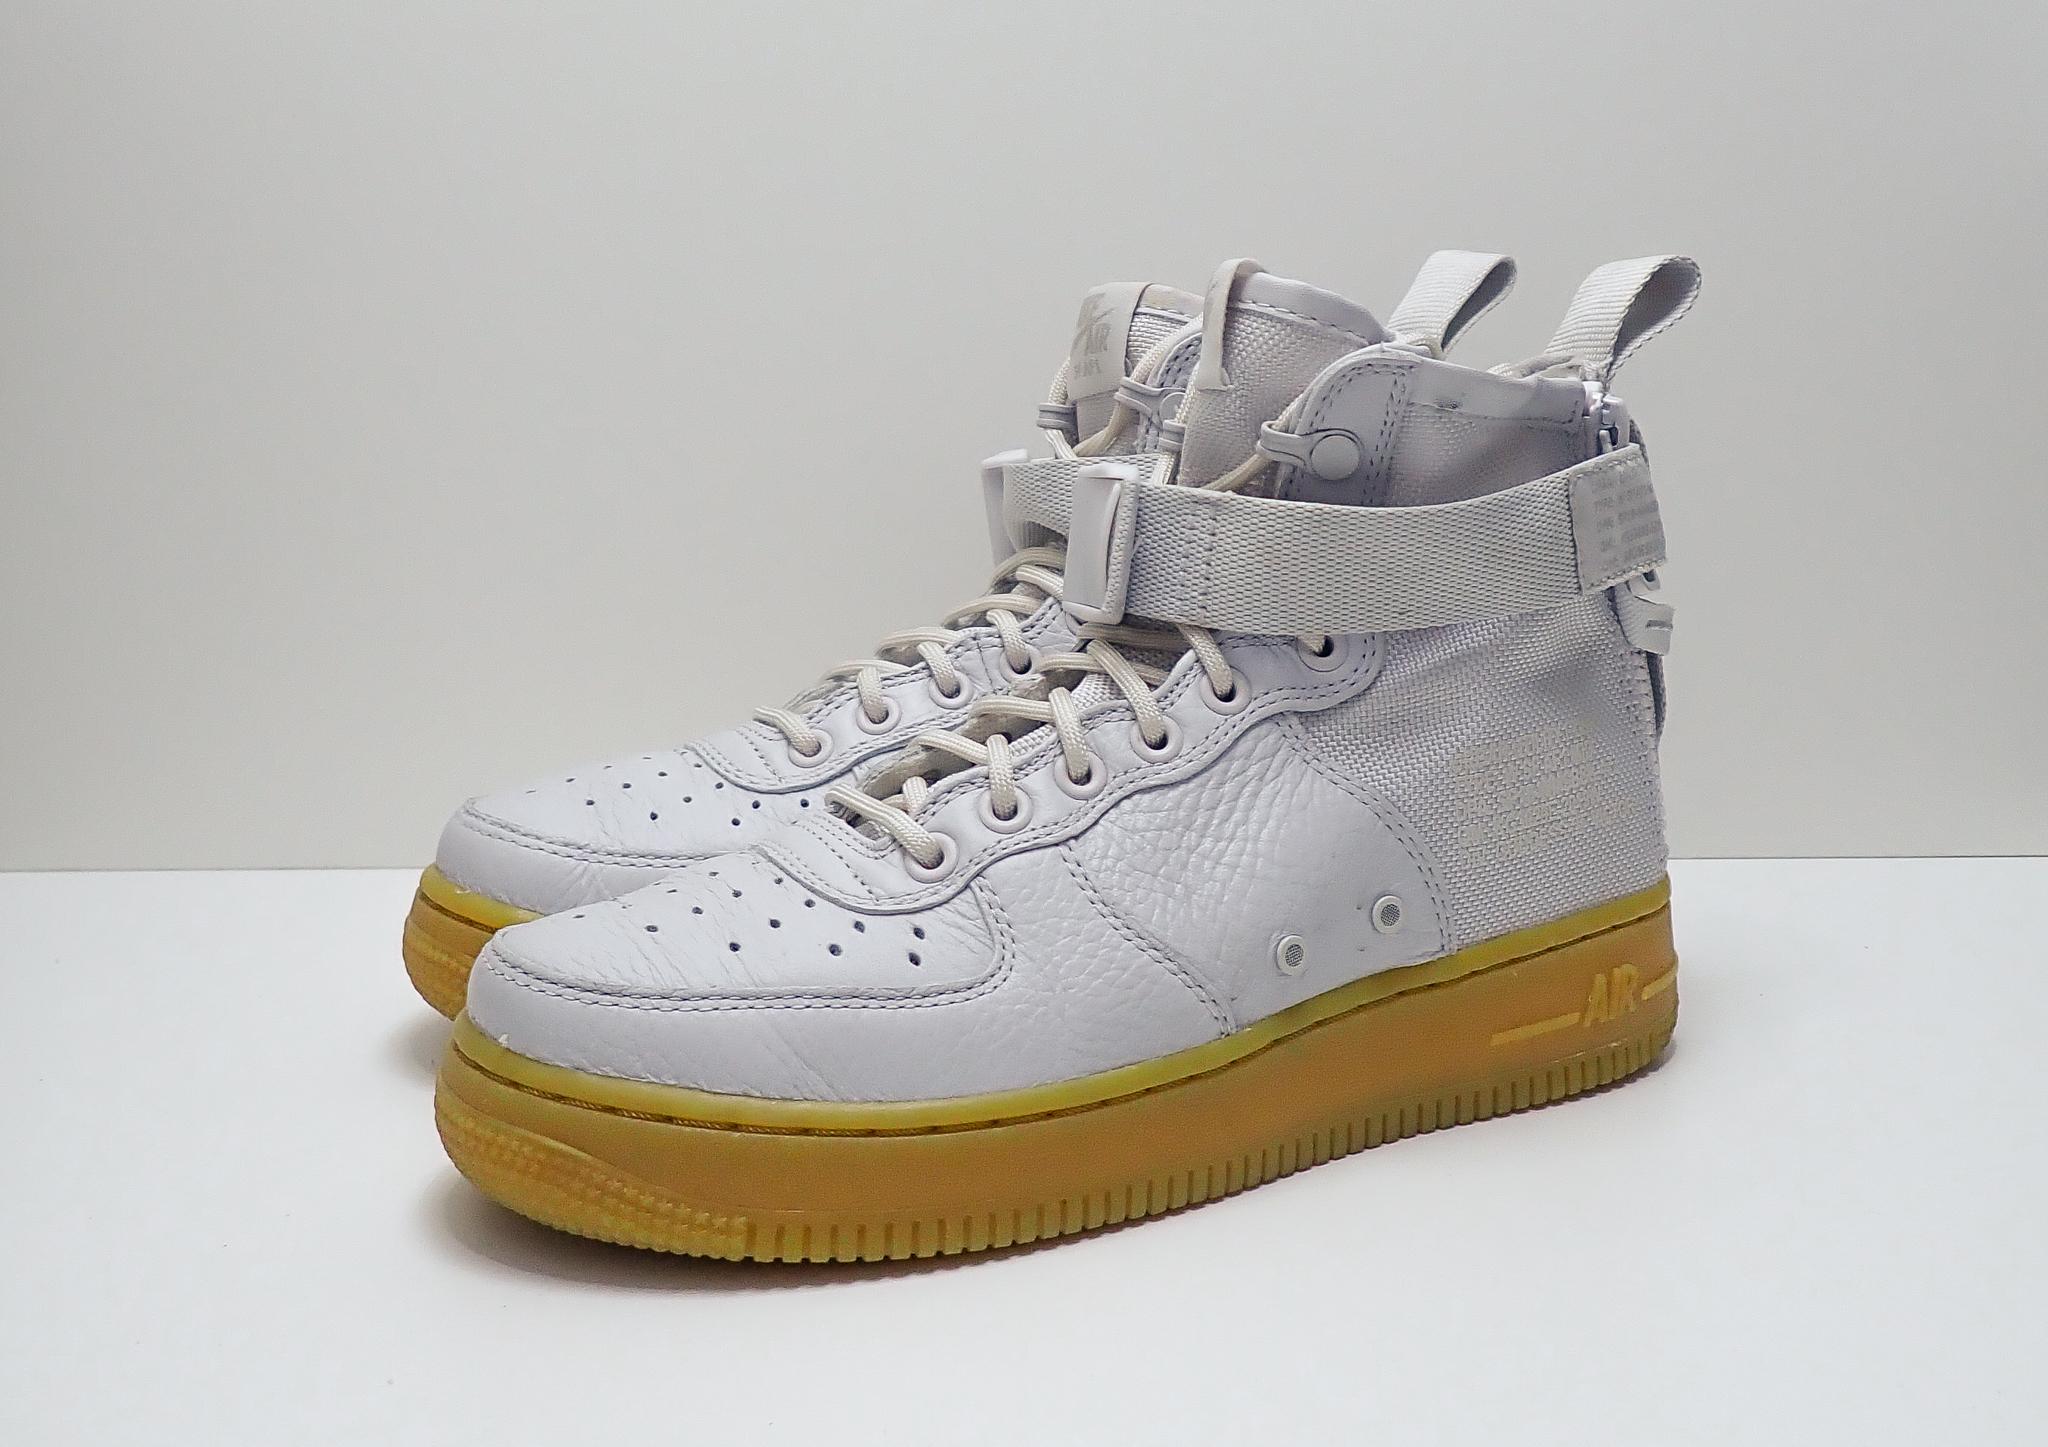 Nike Wmns SF Air Force 1 Mid Vast Grey